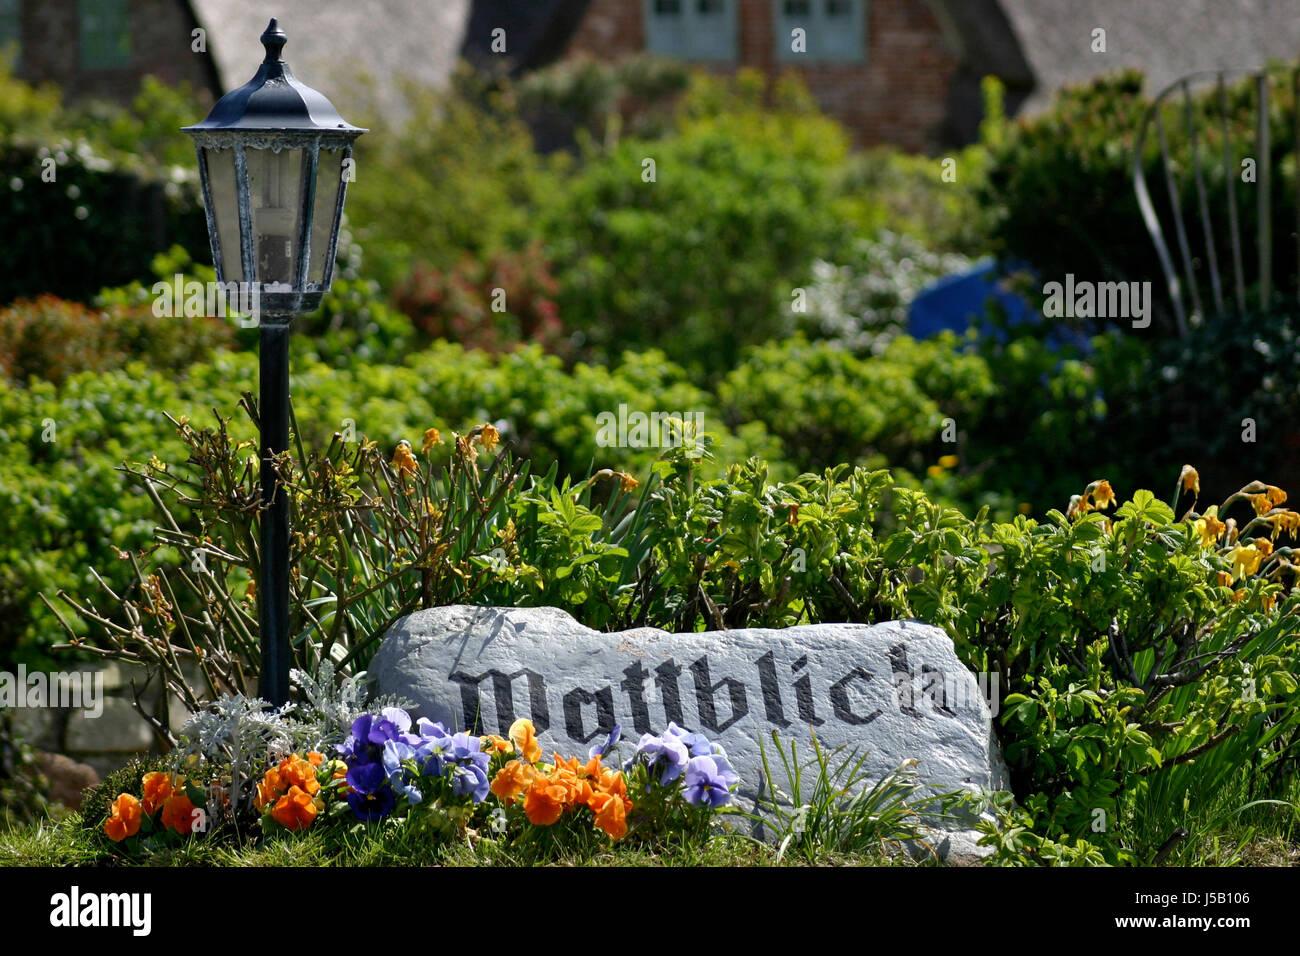 garden stone flower flowers plant beach seaside the beach seashore writing font - Stock Image